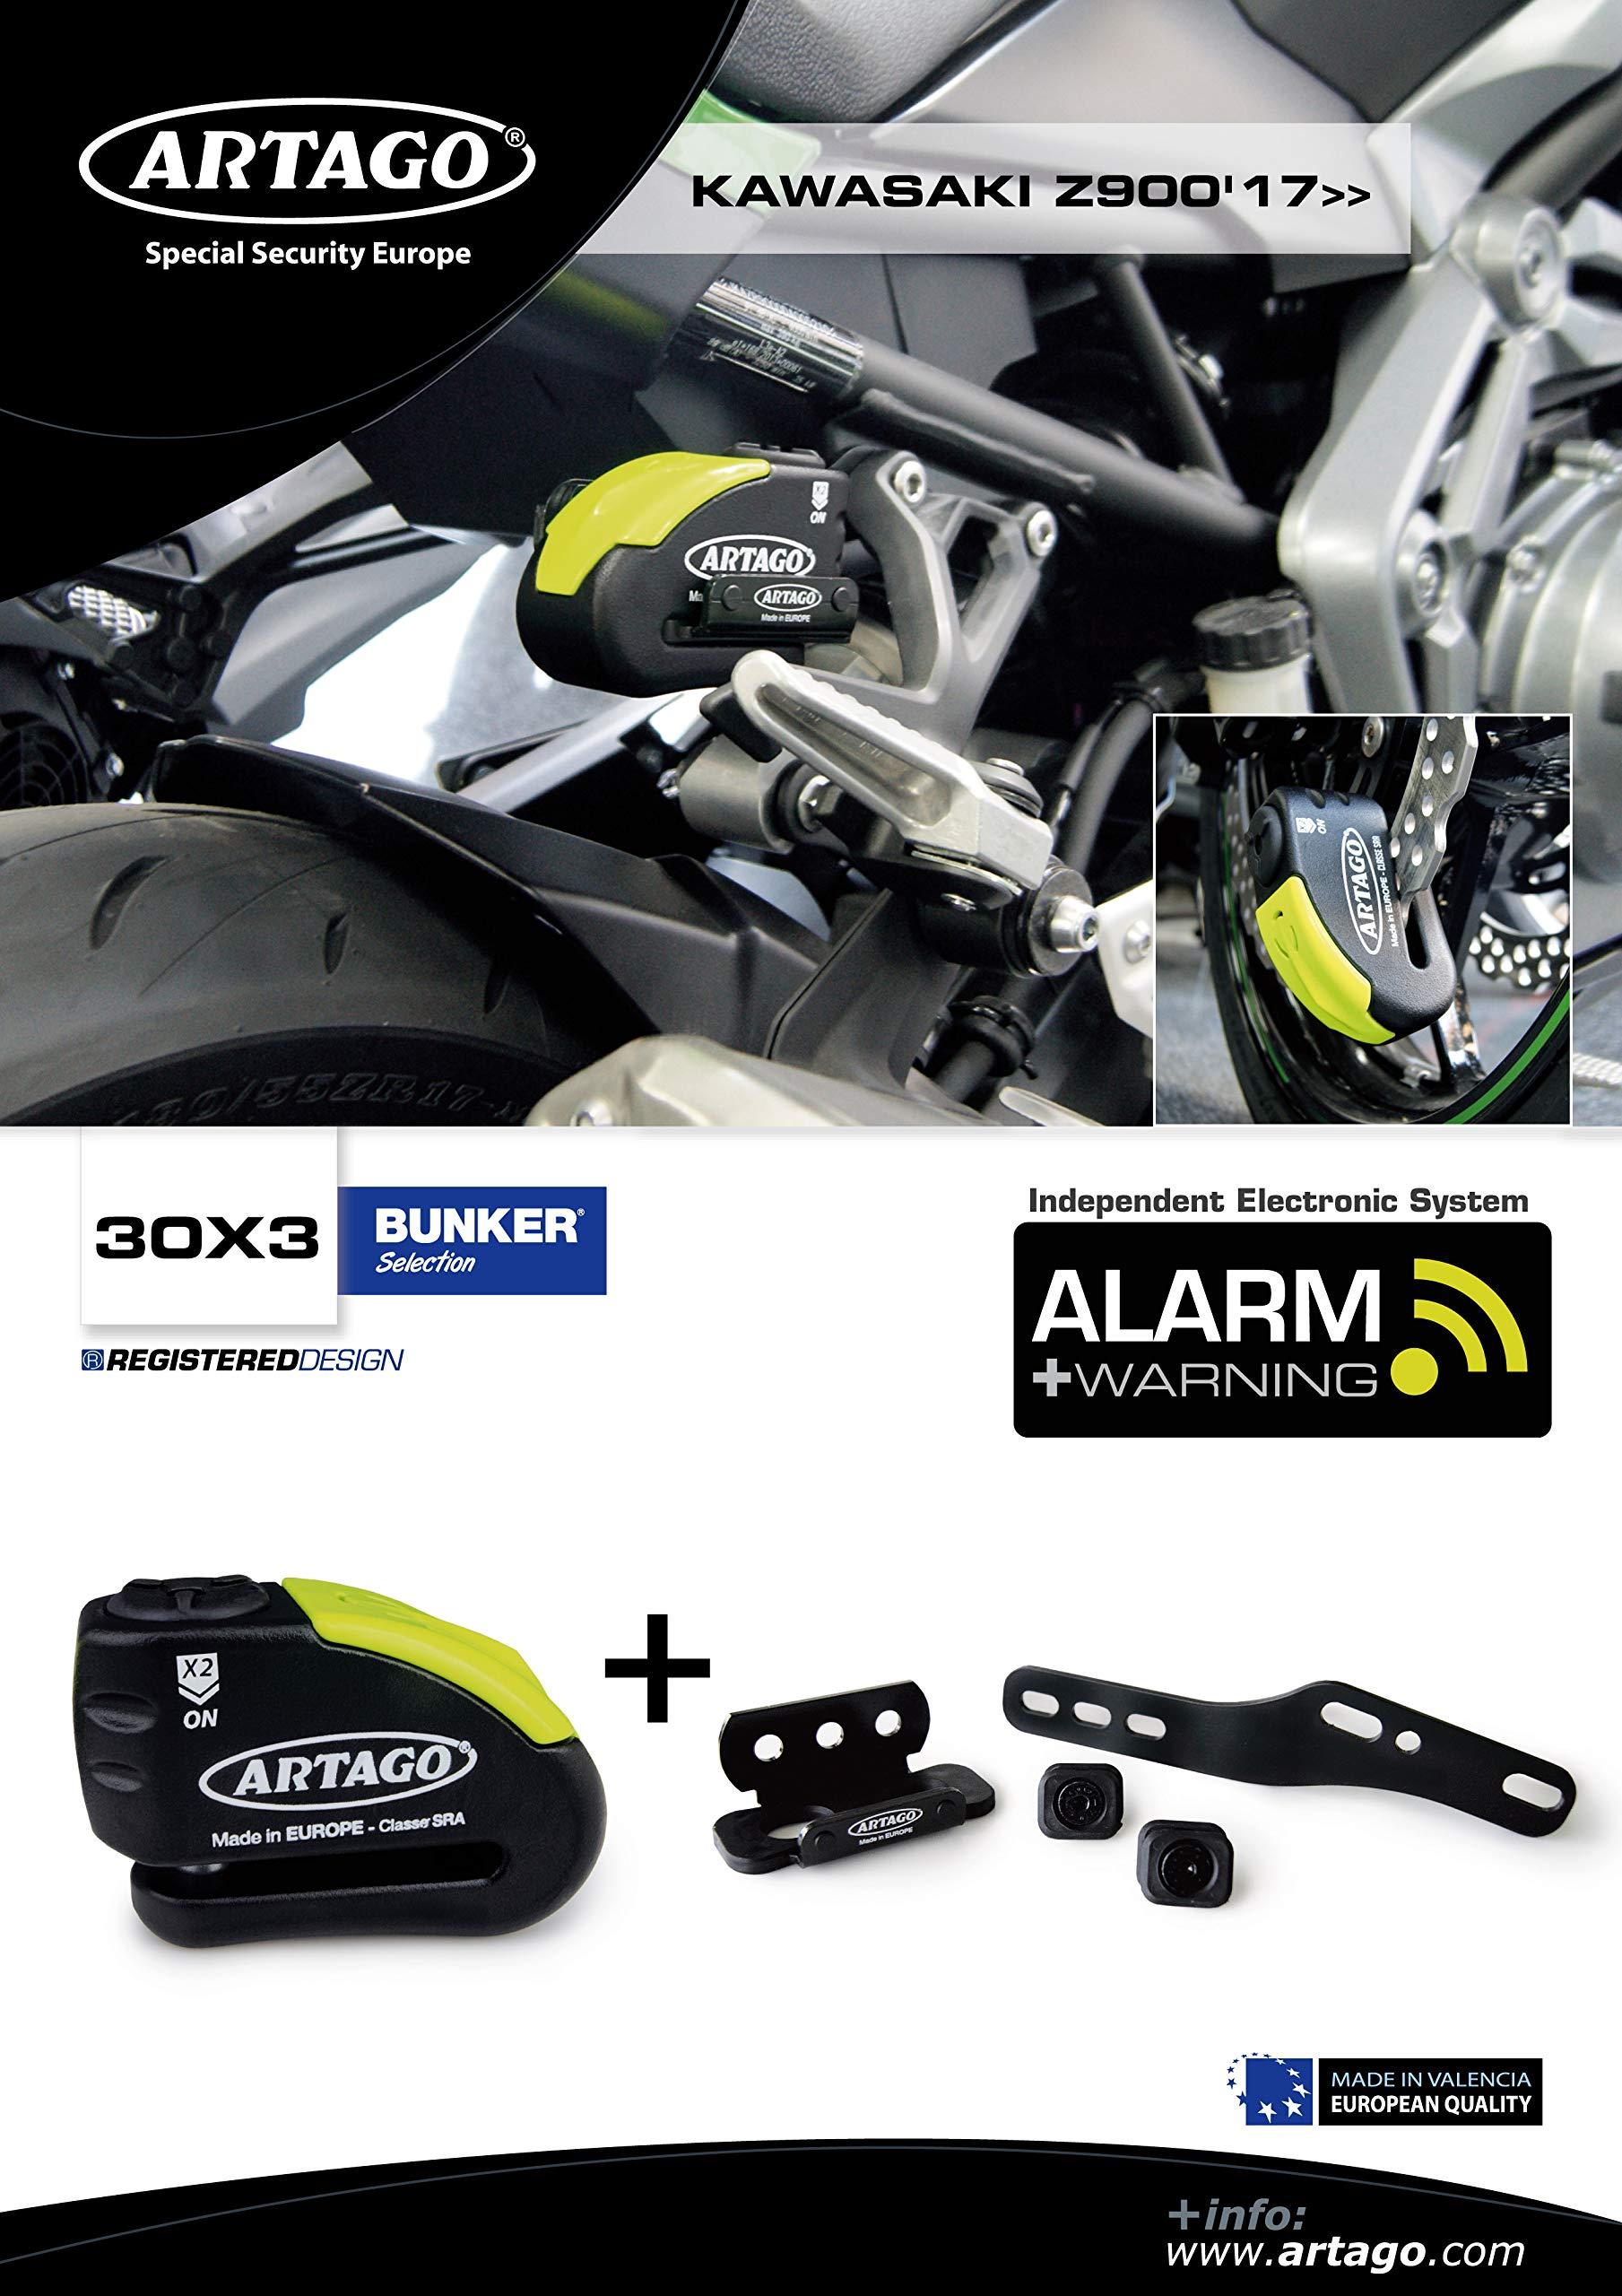 Artago 30X3 Anti-Theft Disc Lock with Alarm 120 dB High Range and Support for Kawasaki Z900 2017 2018